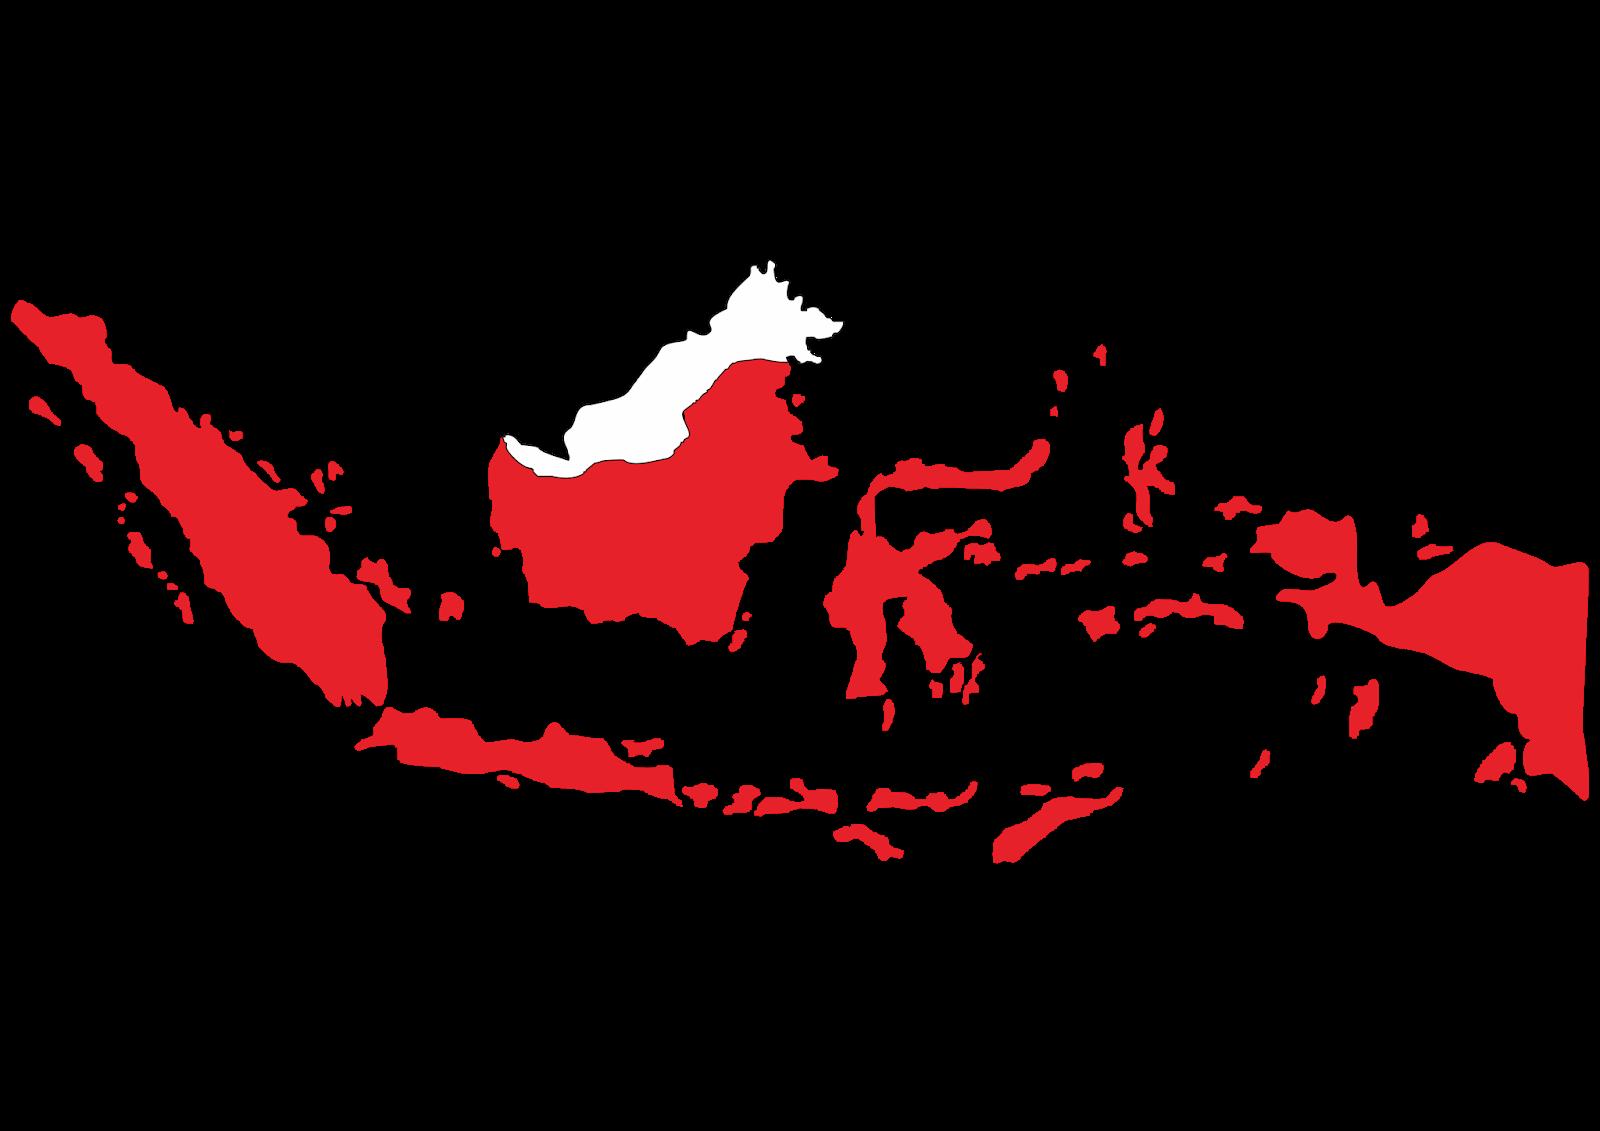 Peta Indonesia Format Cdr Ai Png Hd Logodud Format Cdr Png Ai Eps